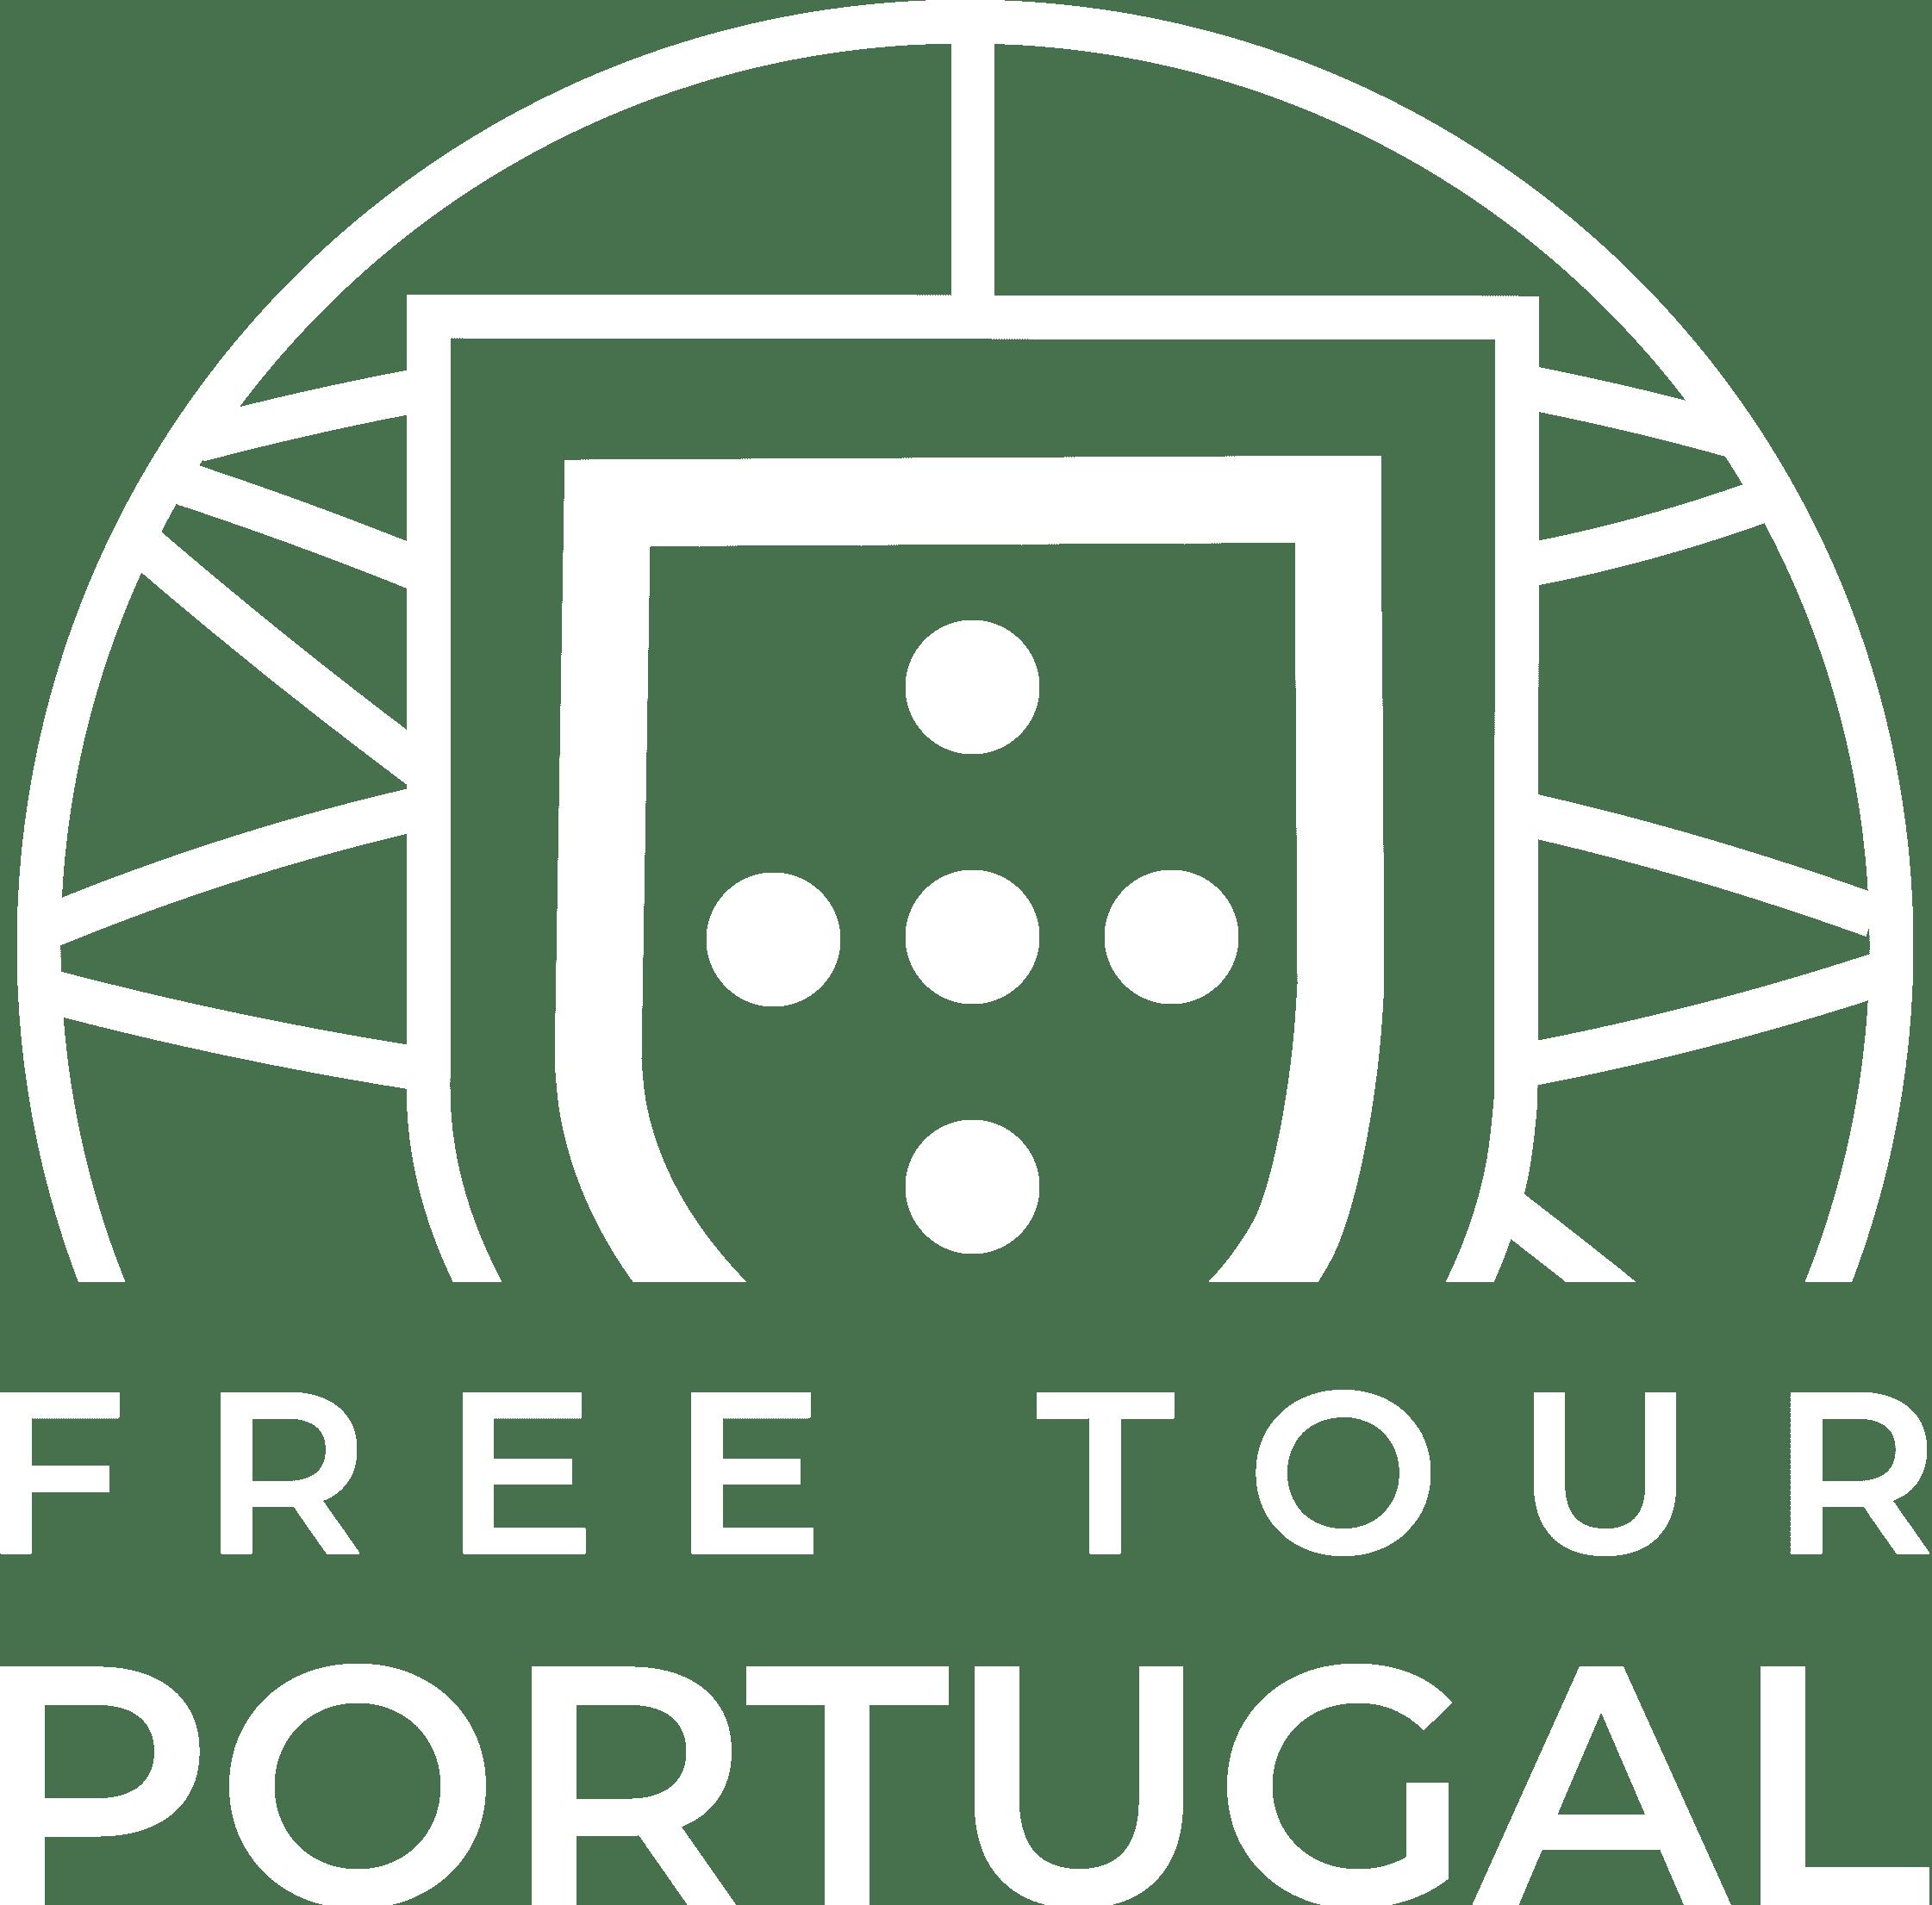 Free Tour Portugal